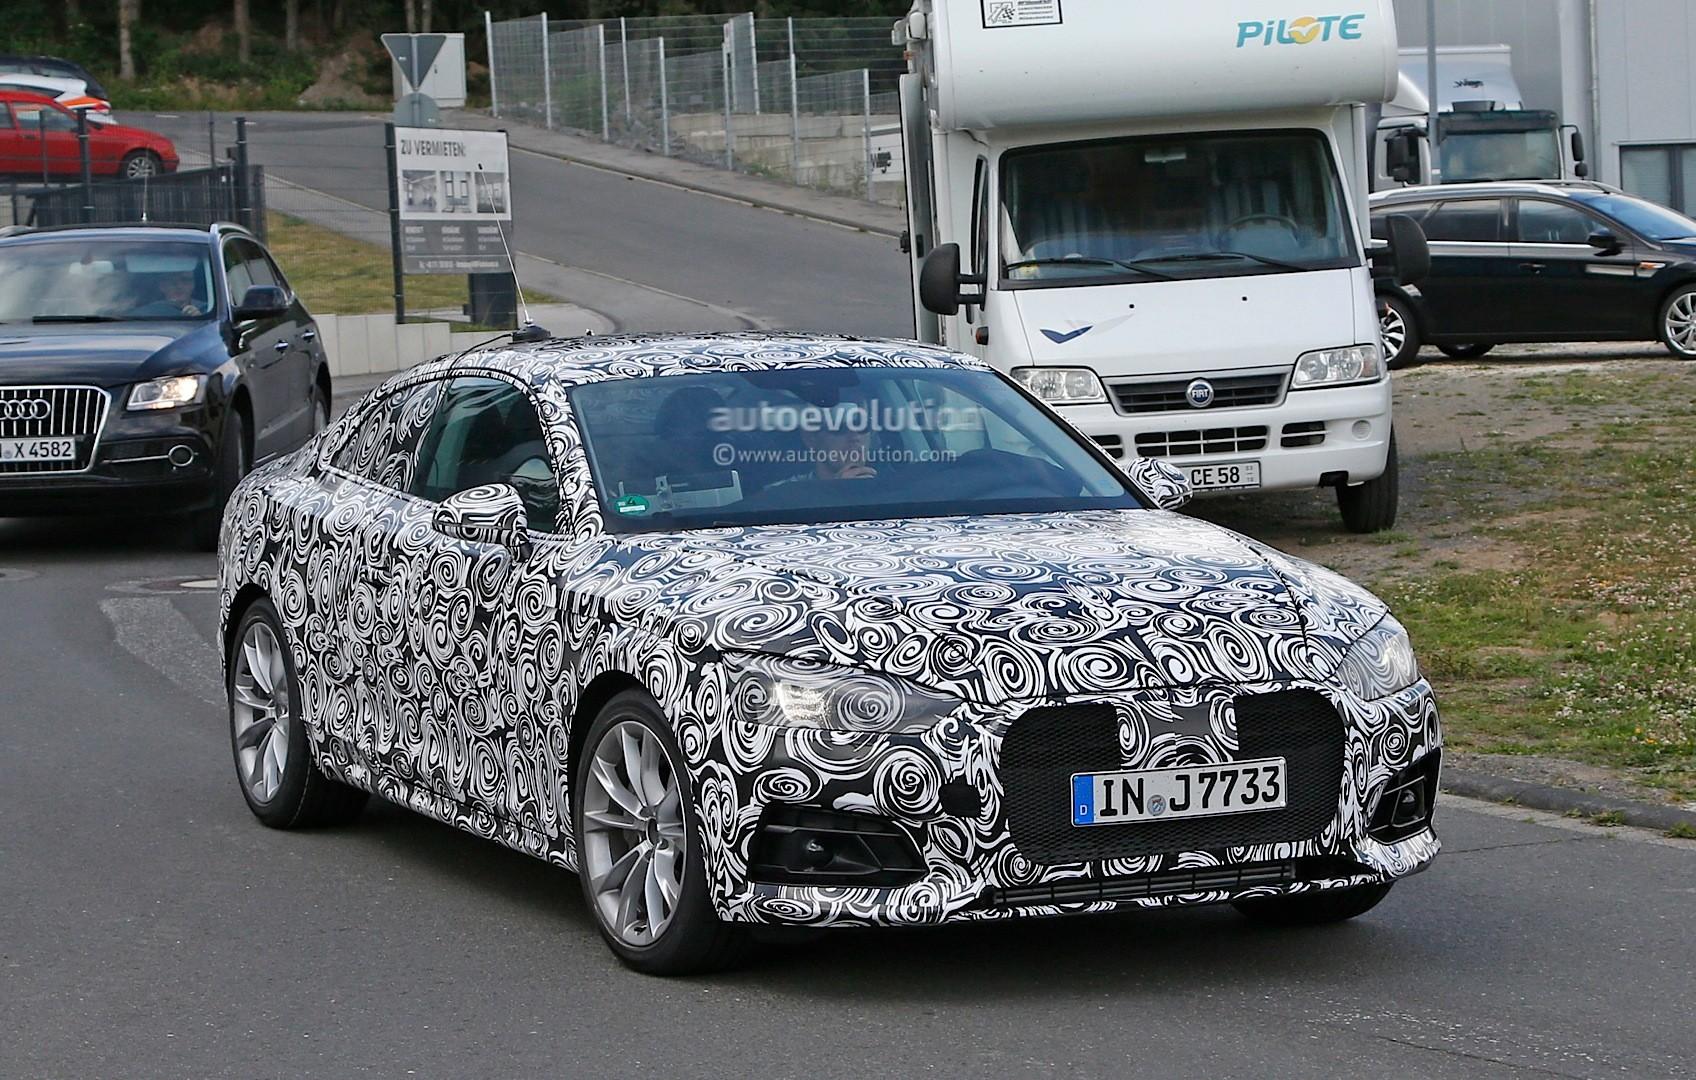 2016 - [Audi] A5 Coupé, Cabriolet et Sportback - Page 2 All-new-2017-audi-a5-coupe-first-spy-photos-show-evolutionary-design_2